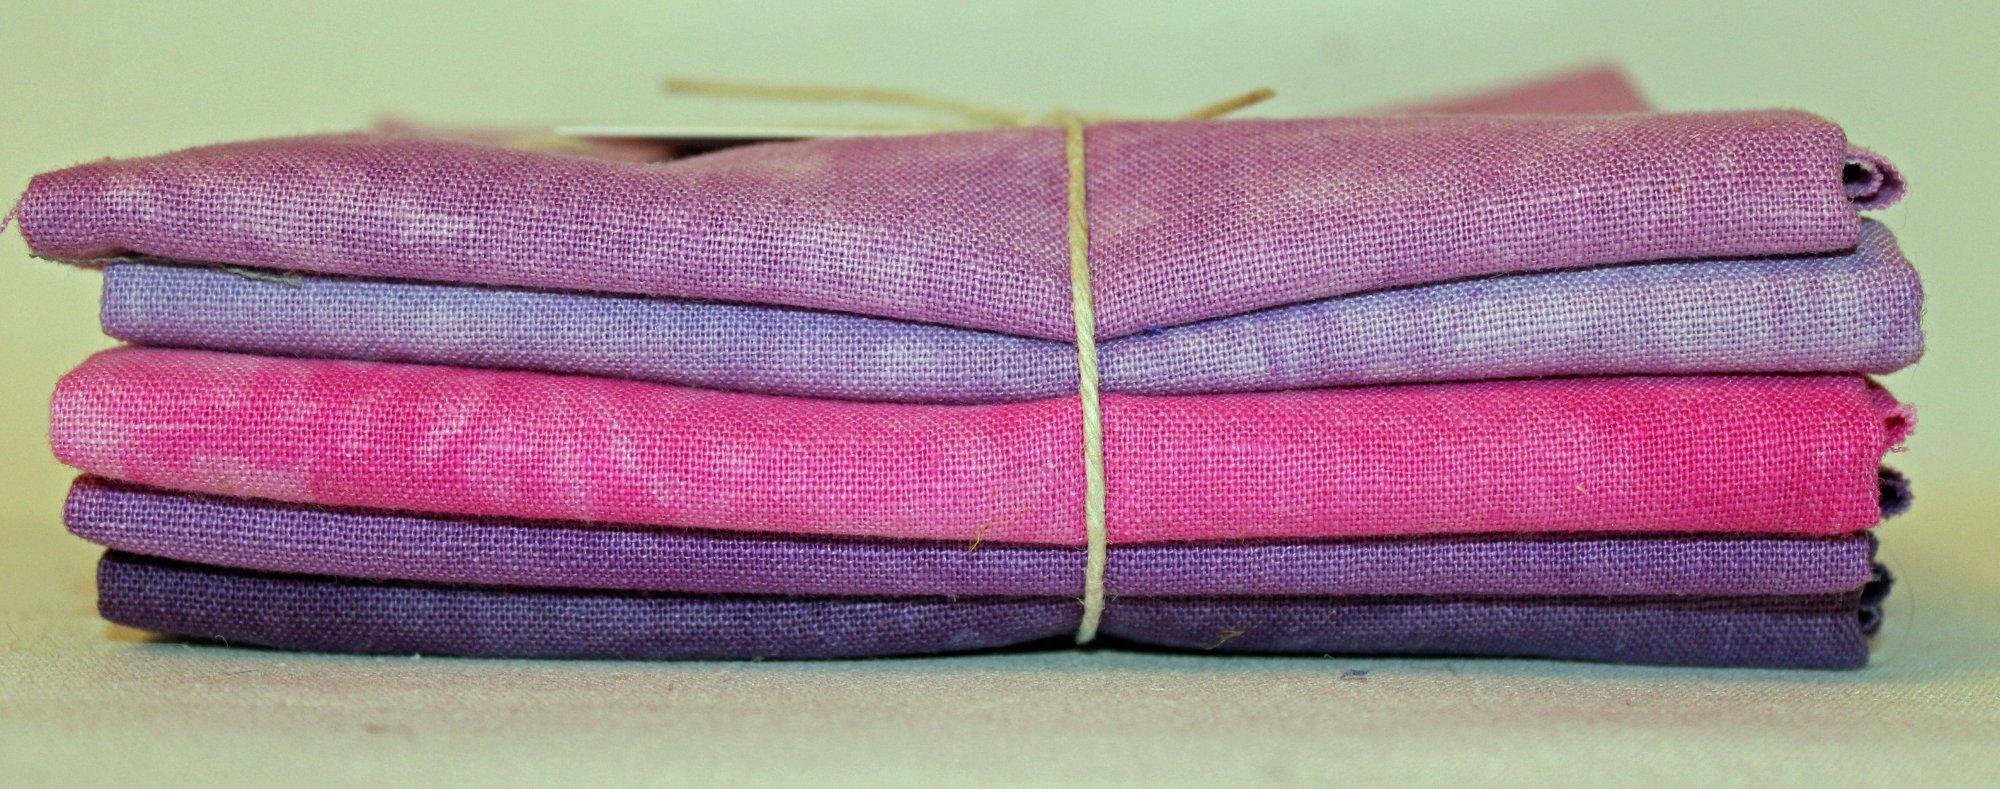 Berry Patch Hand-dyed Linen Fat Quarter 5pc Set